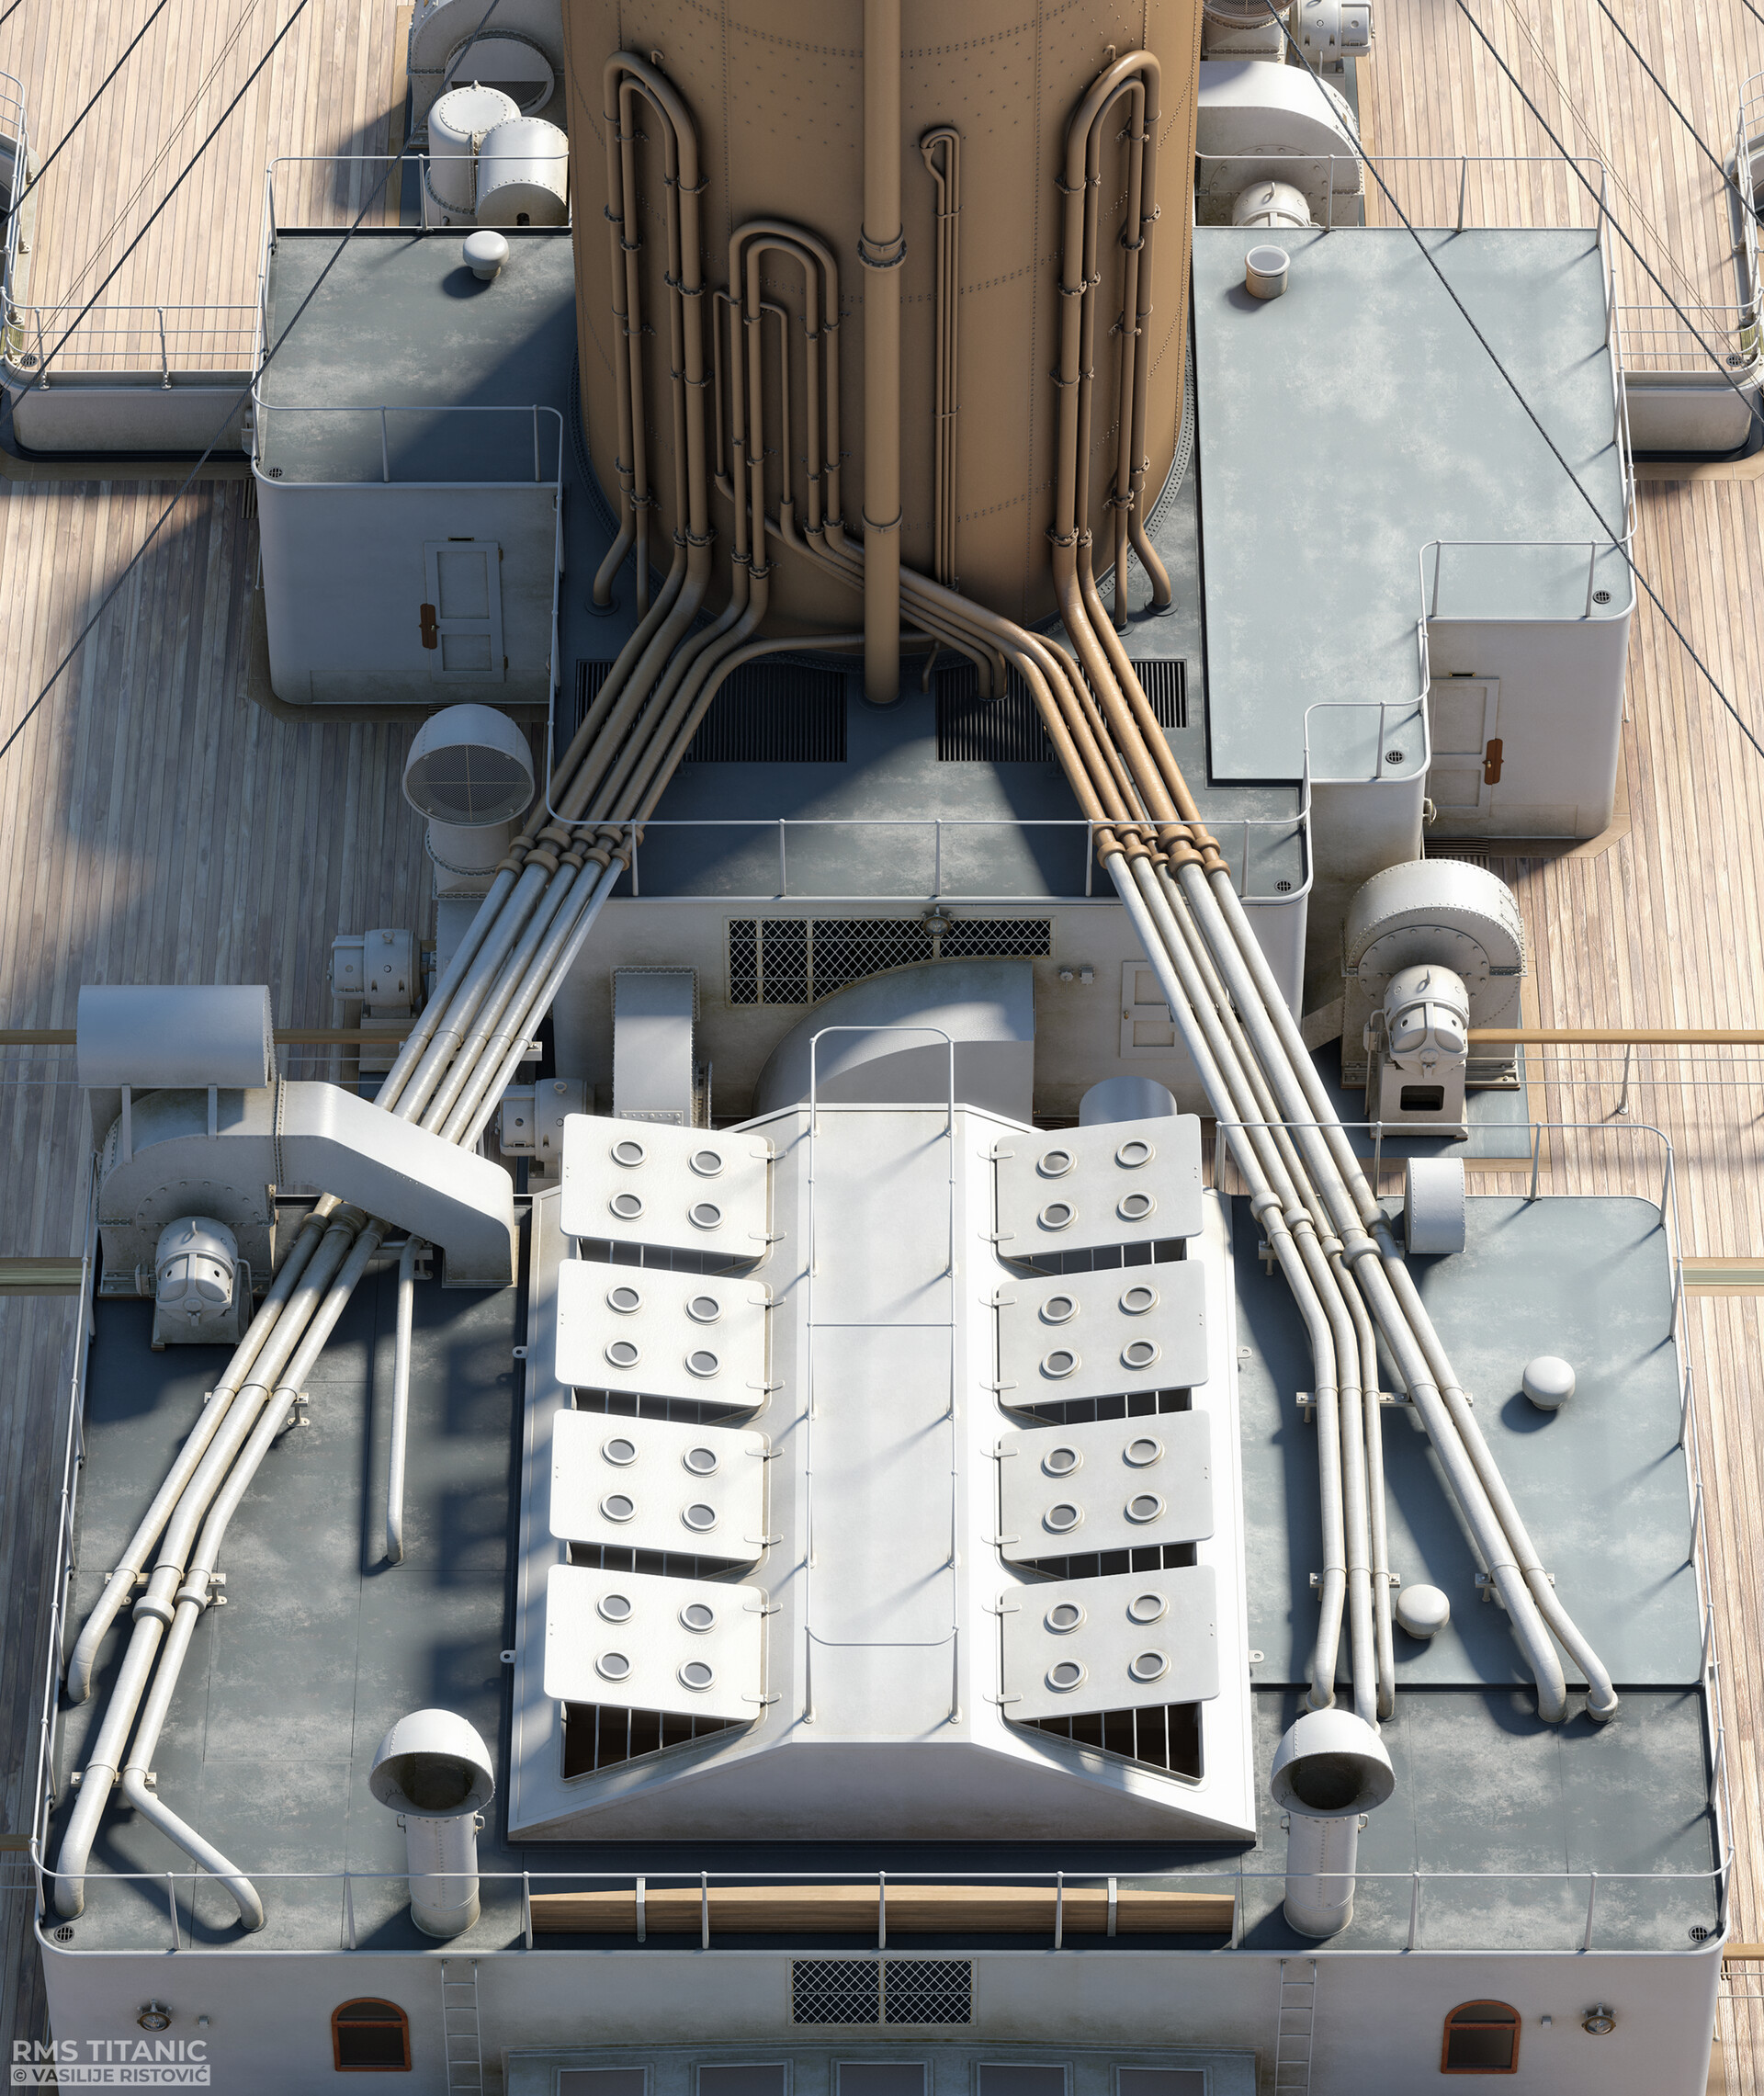 Montage Titanic Trumpeter 1/200 - Page 10 Vasilije-ristovic-titanic-tank-top-02